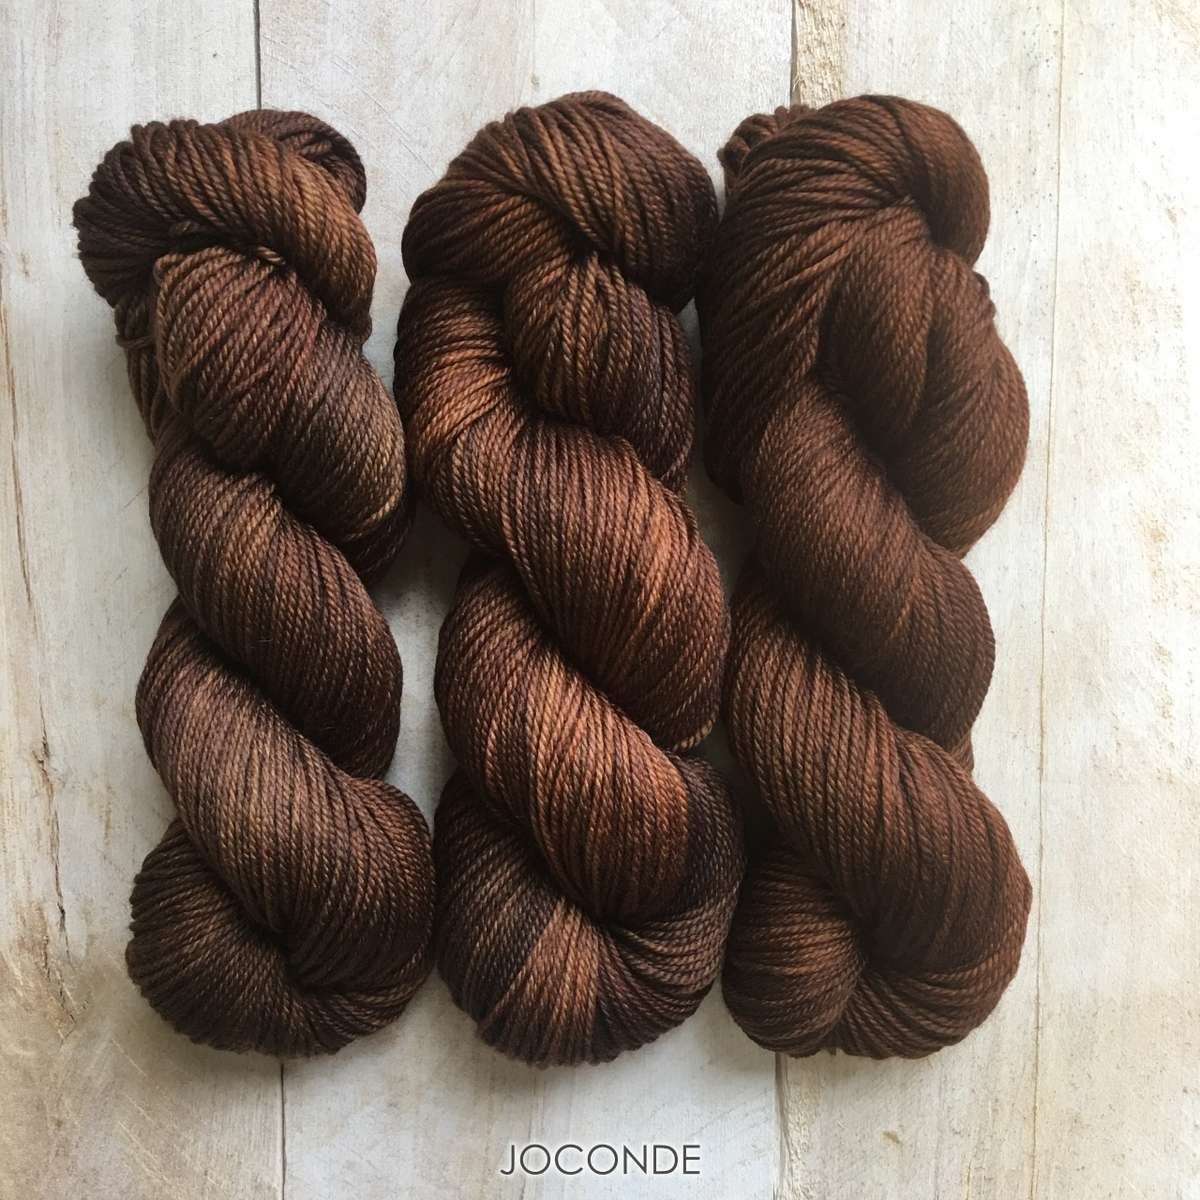 Hand-dyed yarn Louise Robert Joconde